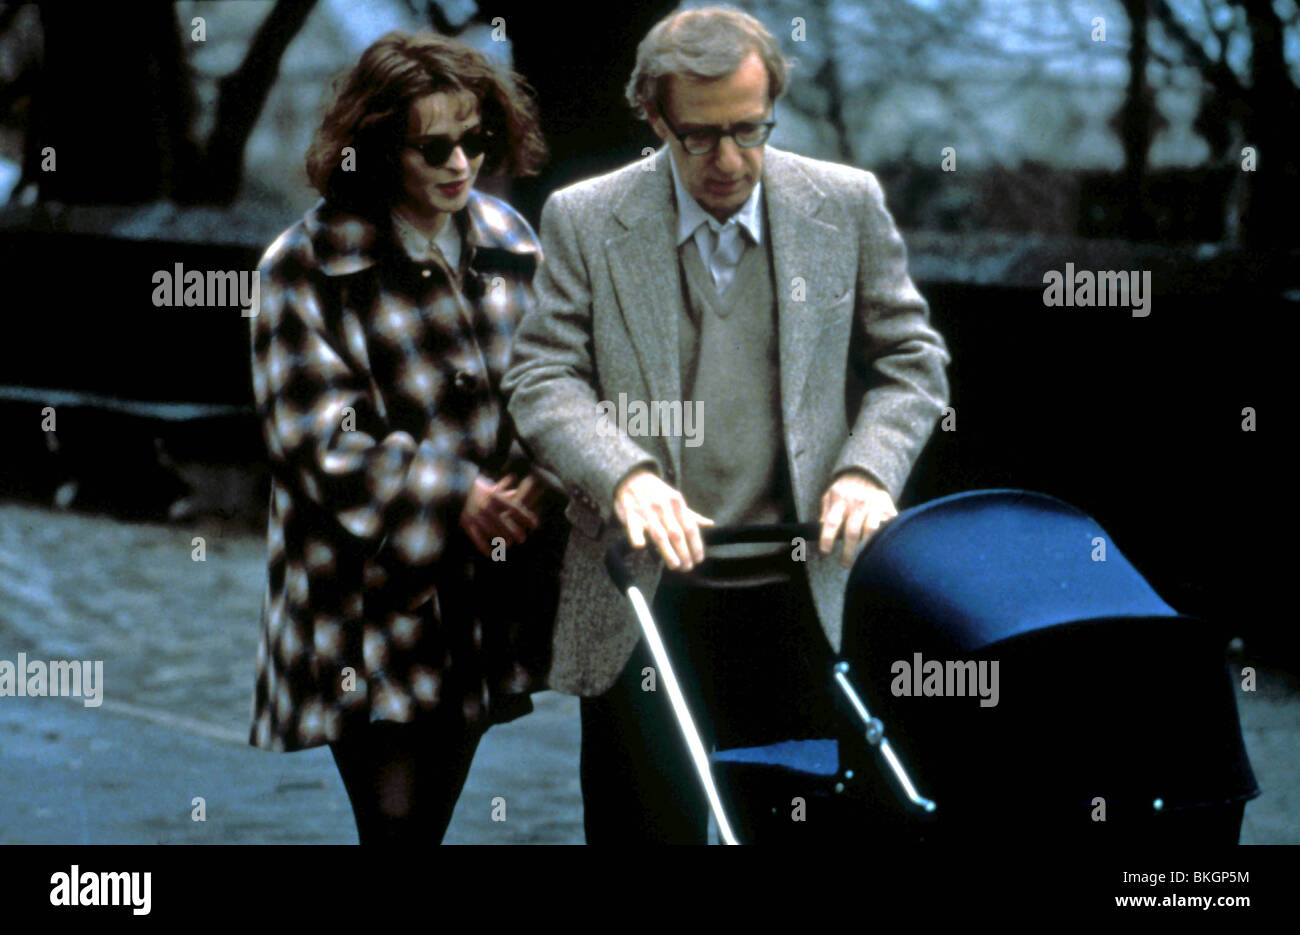 MIGHTY APHRODITE (1995) HELENA BONHAM CARTER, WOODY ALLEN MTAD 048 - Stock Image